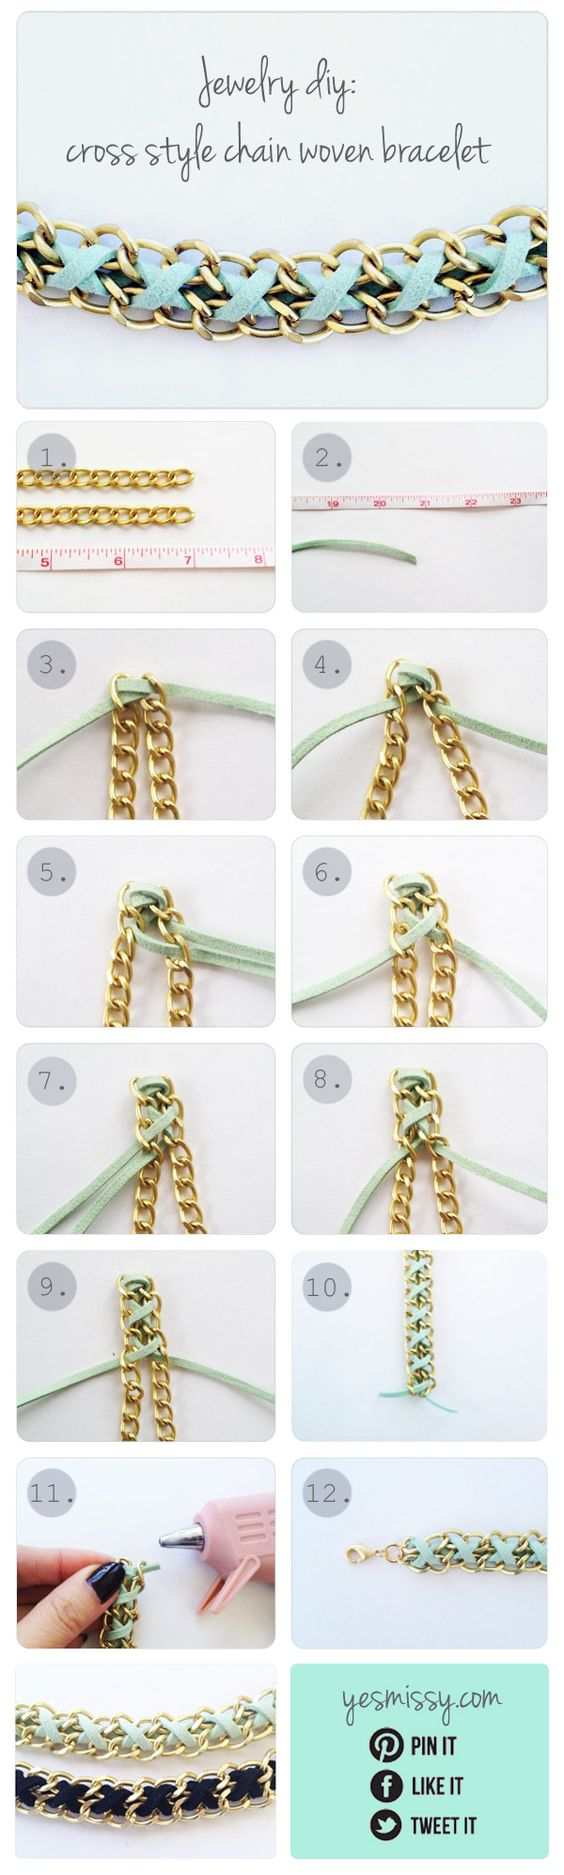 26 DIY Summer Inspiration Ideas, DIY Bracelet: Cross Style Chain Woven Bracelet: